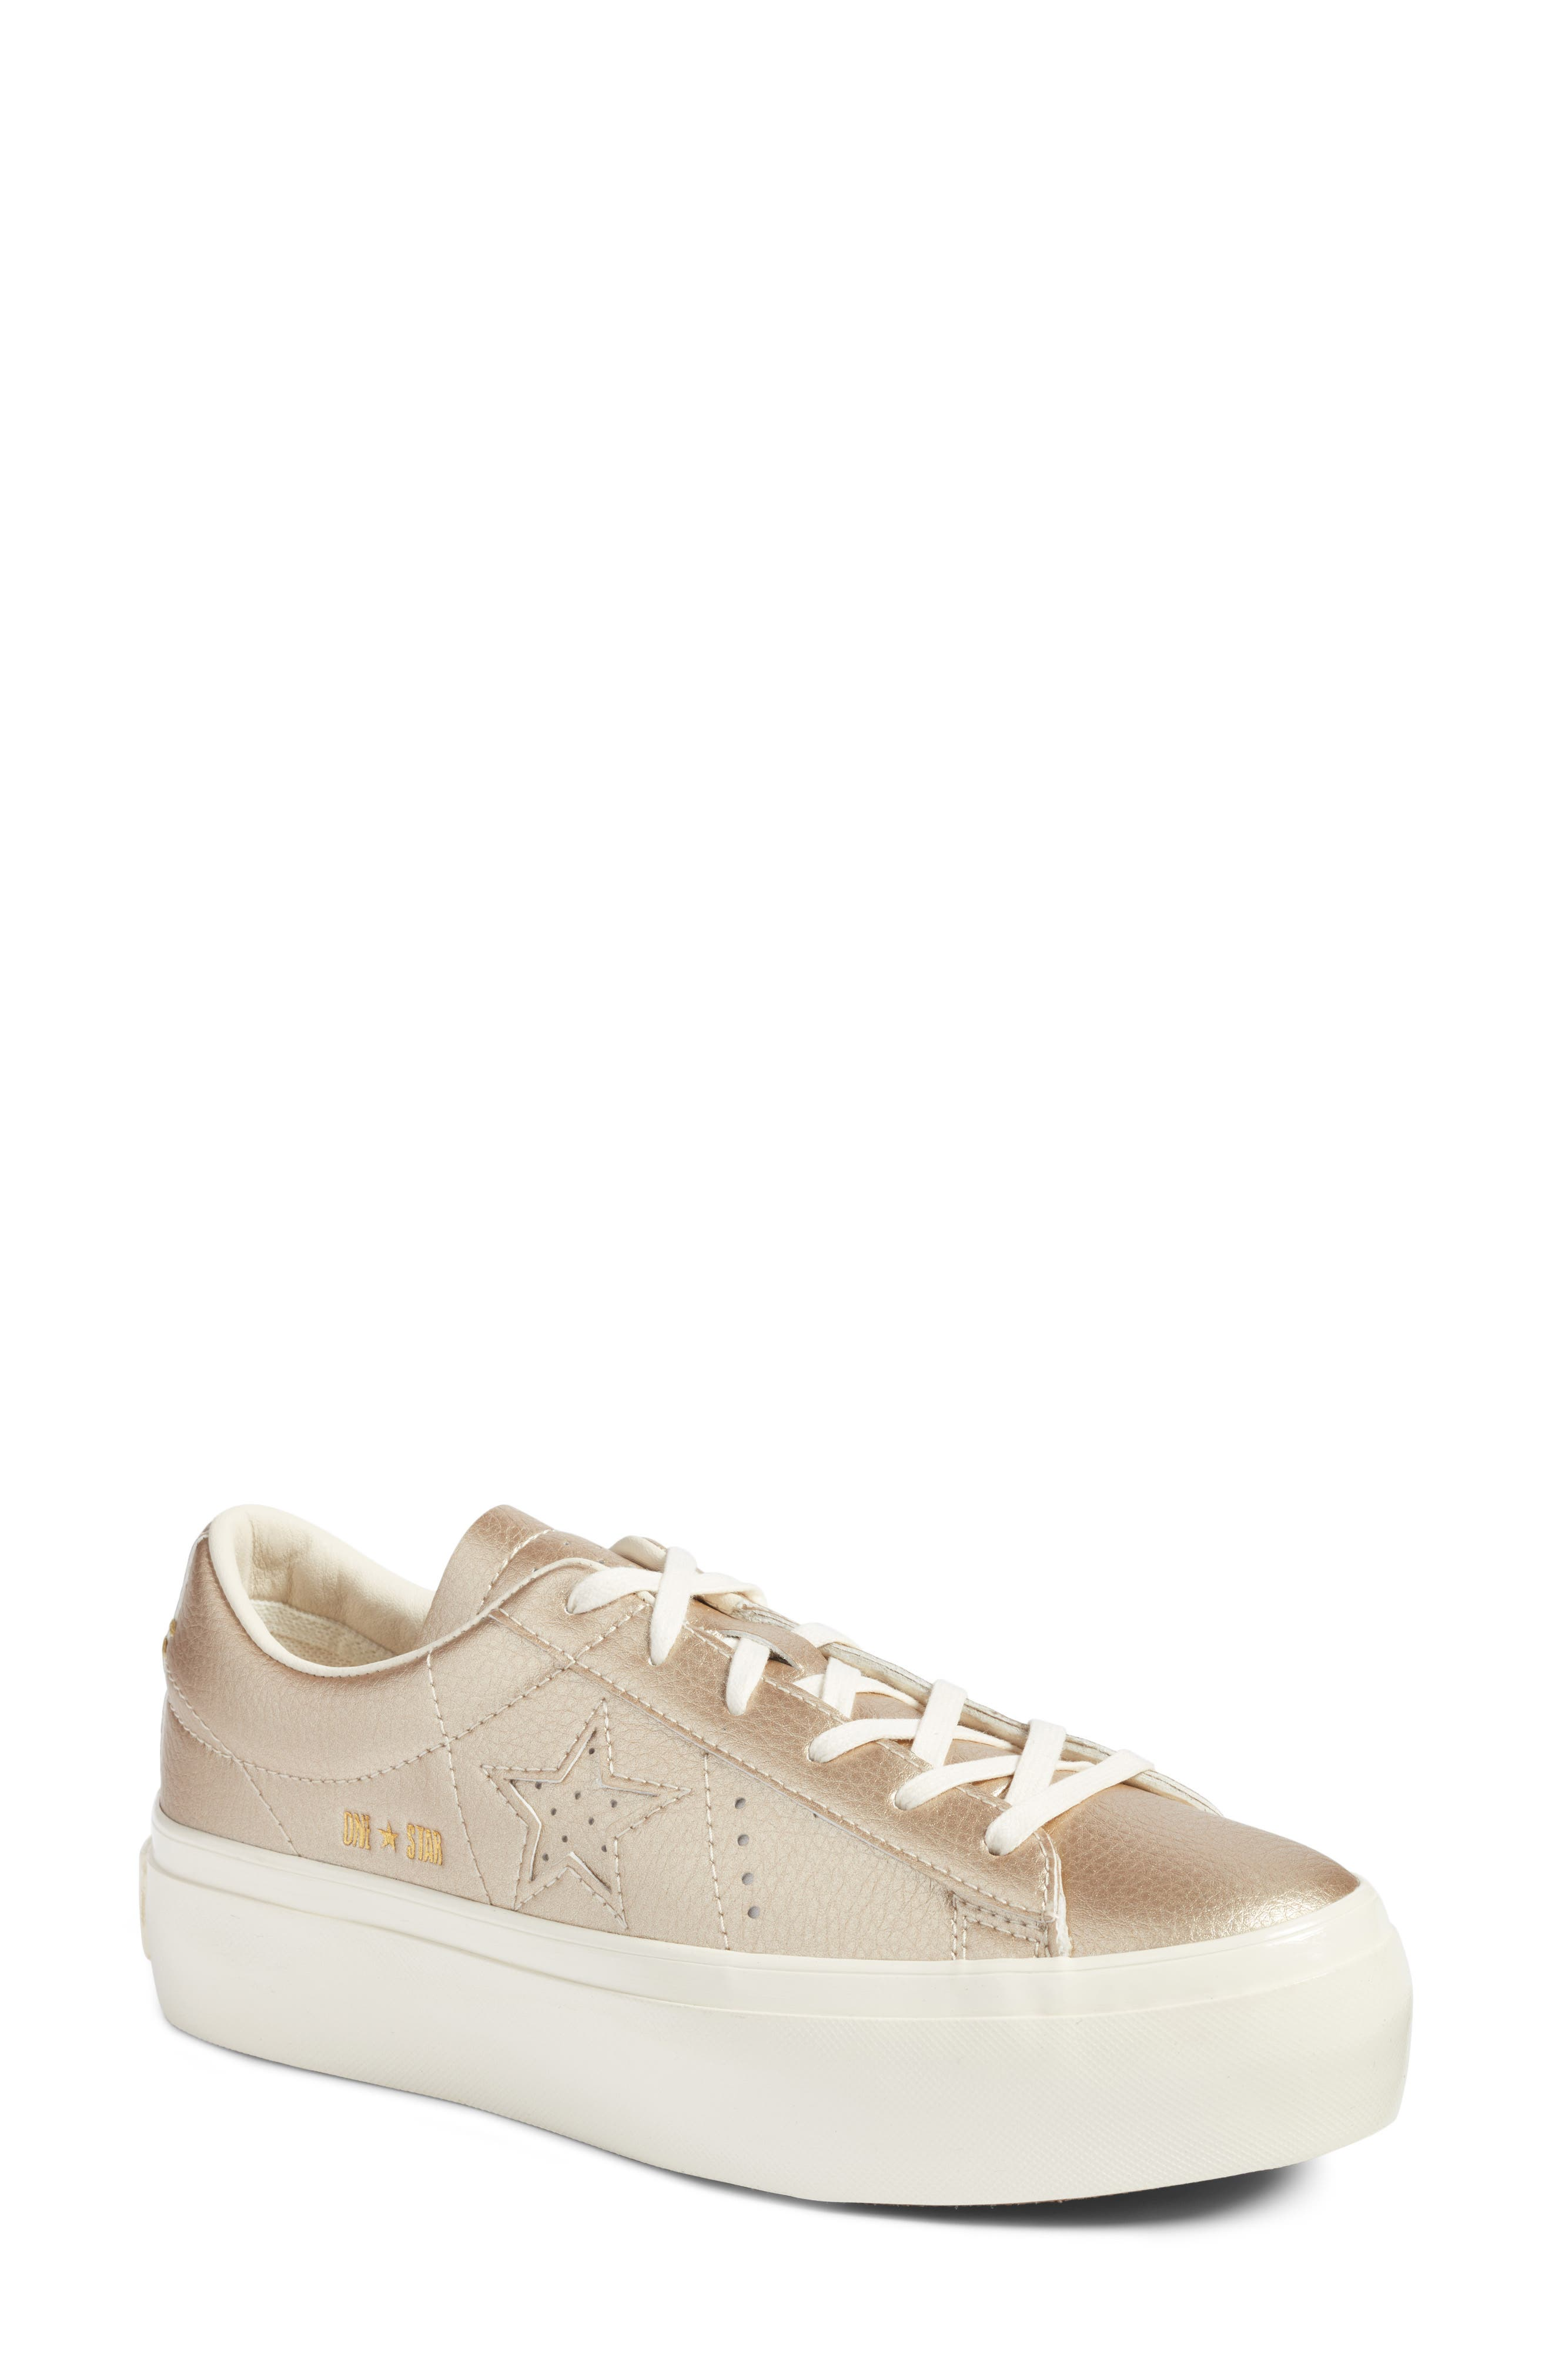 Main Image - Converse Chuck Taylor® All Star® One Star Metallic Platform Sneaker (Women)